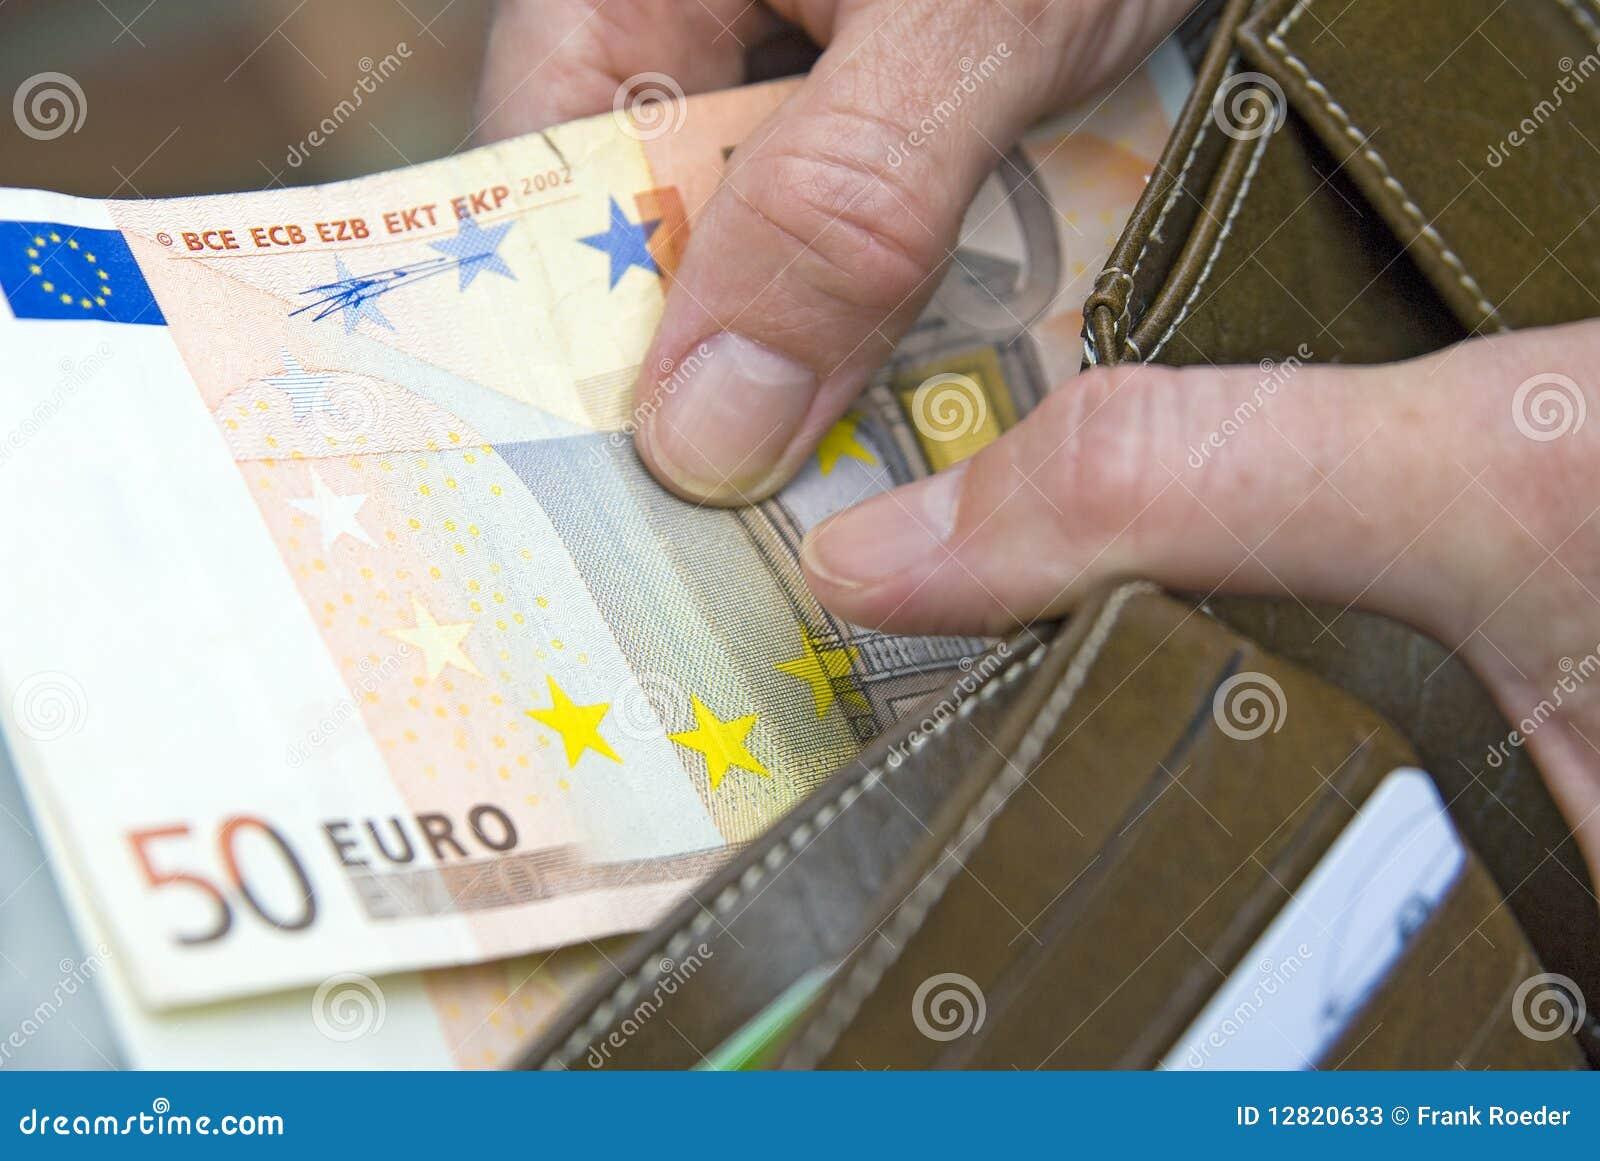 50 euro stock image image of brown bill plug pull for Wohnwand 50 euro